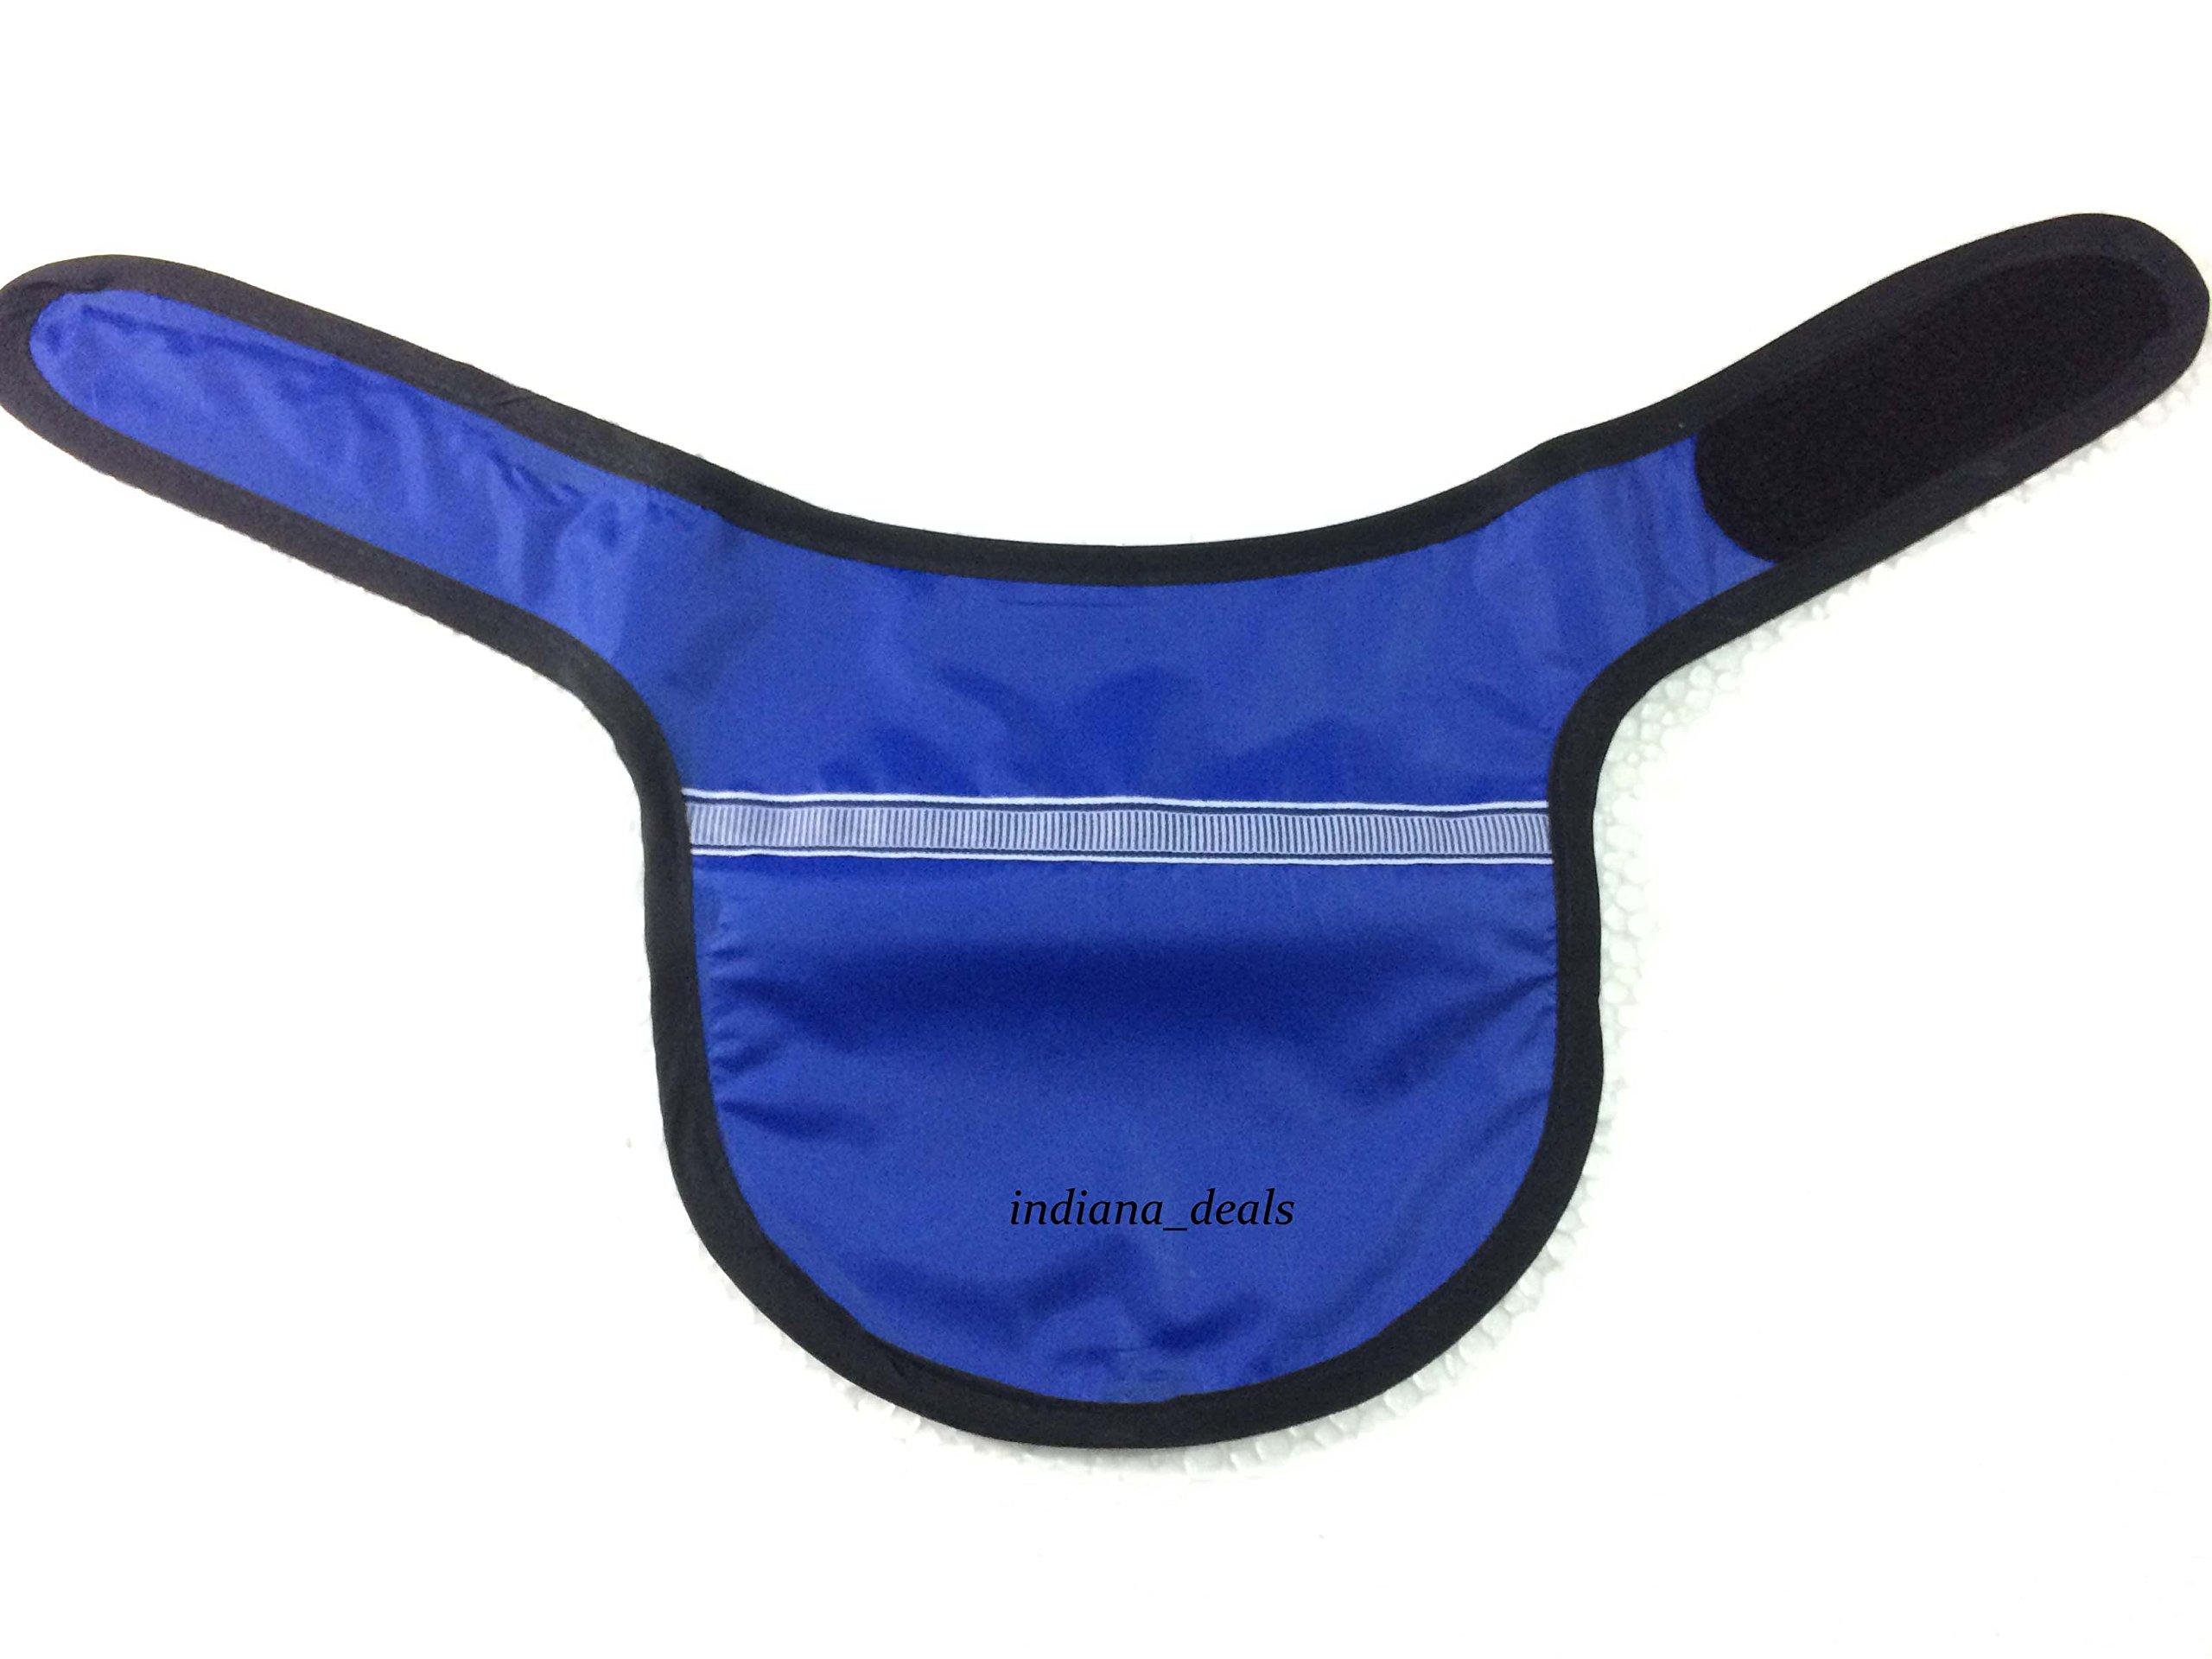 Xray Protective Thyroid Shield (Thyroid Collar) – 0.5mm Lead (pb) Equivalency Protection Wear